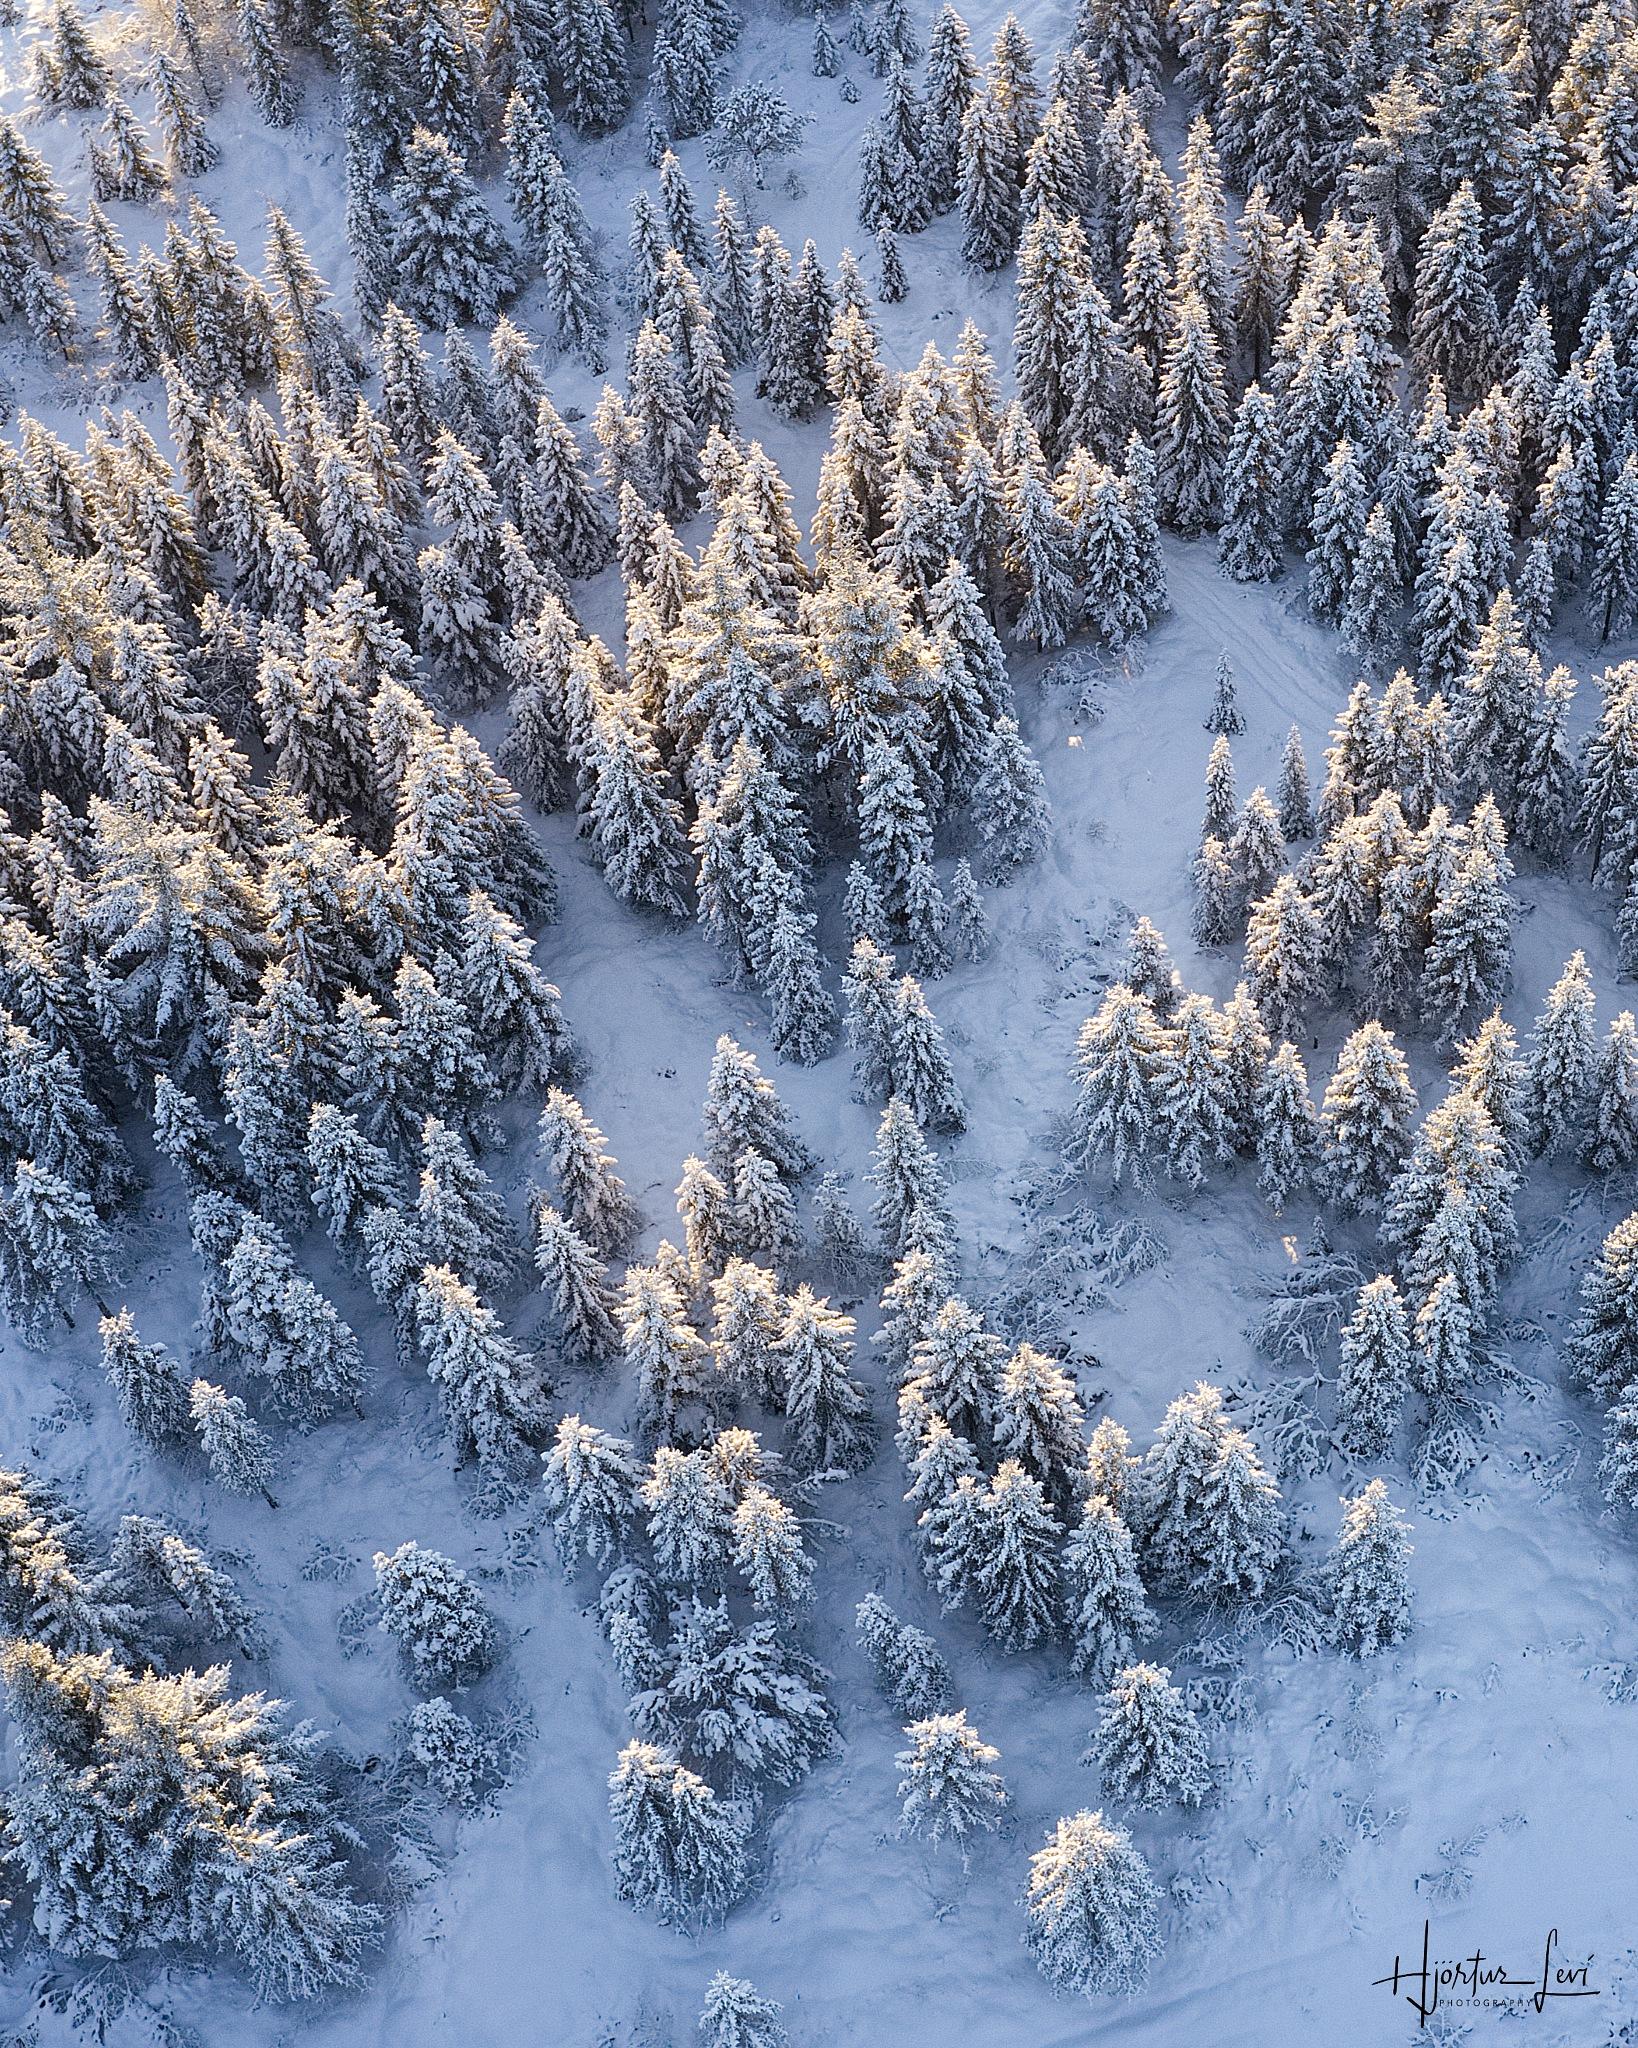 Icelandic Winter by Hjörtur Leví Pétursson